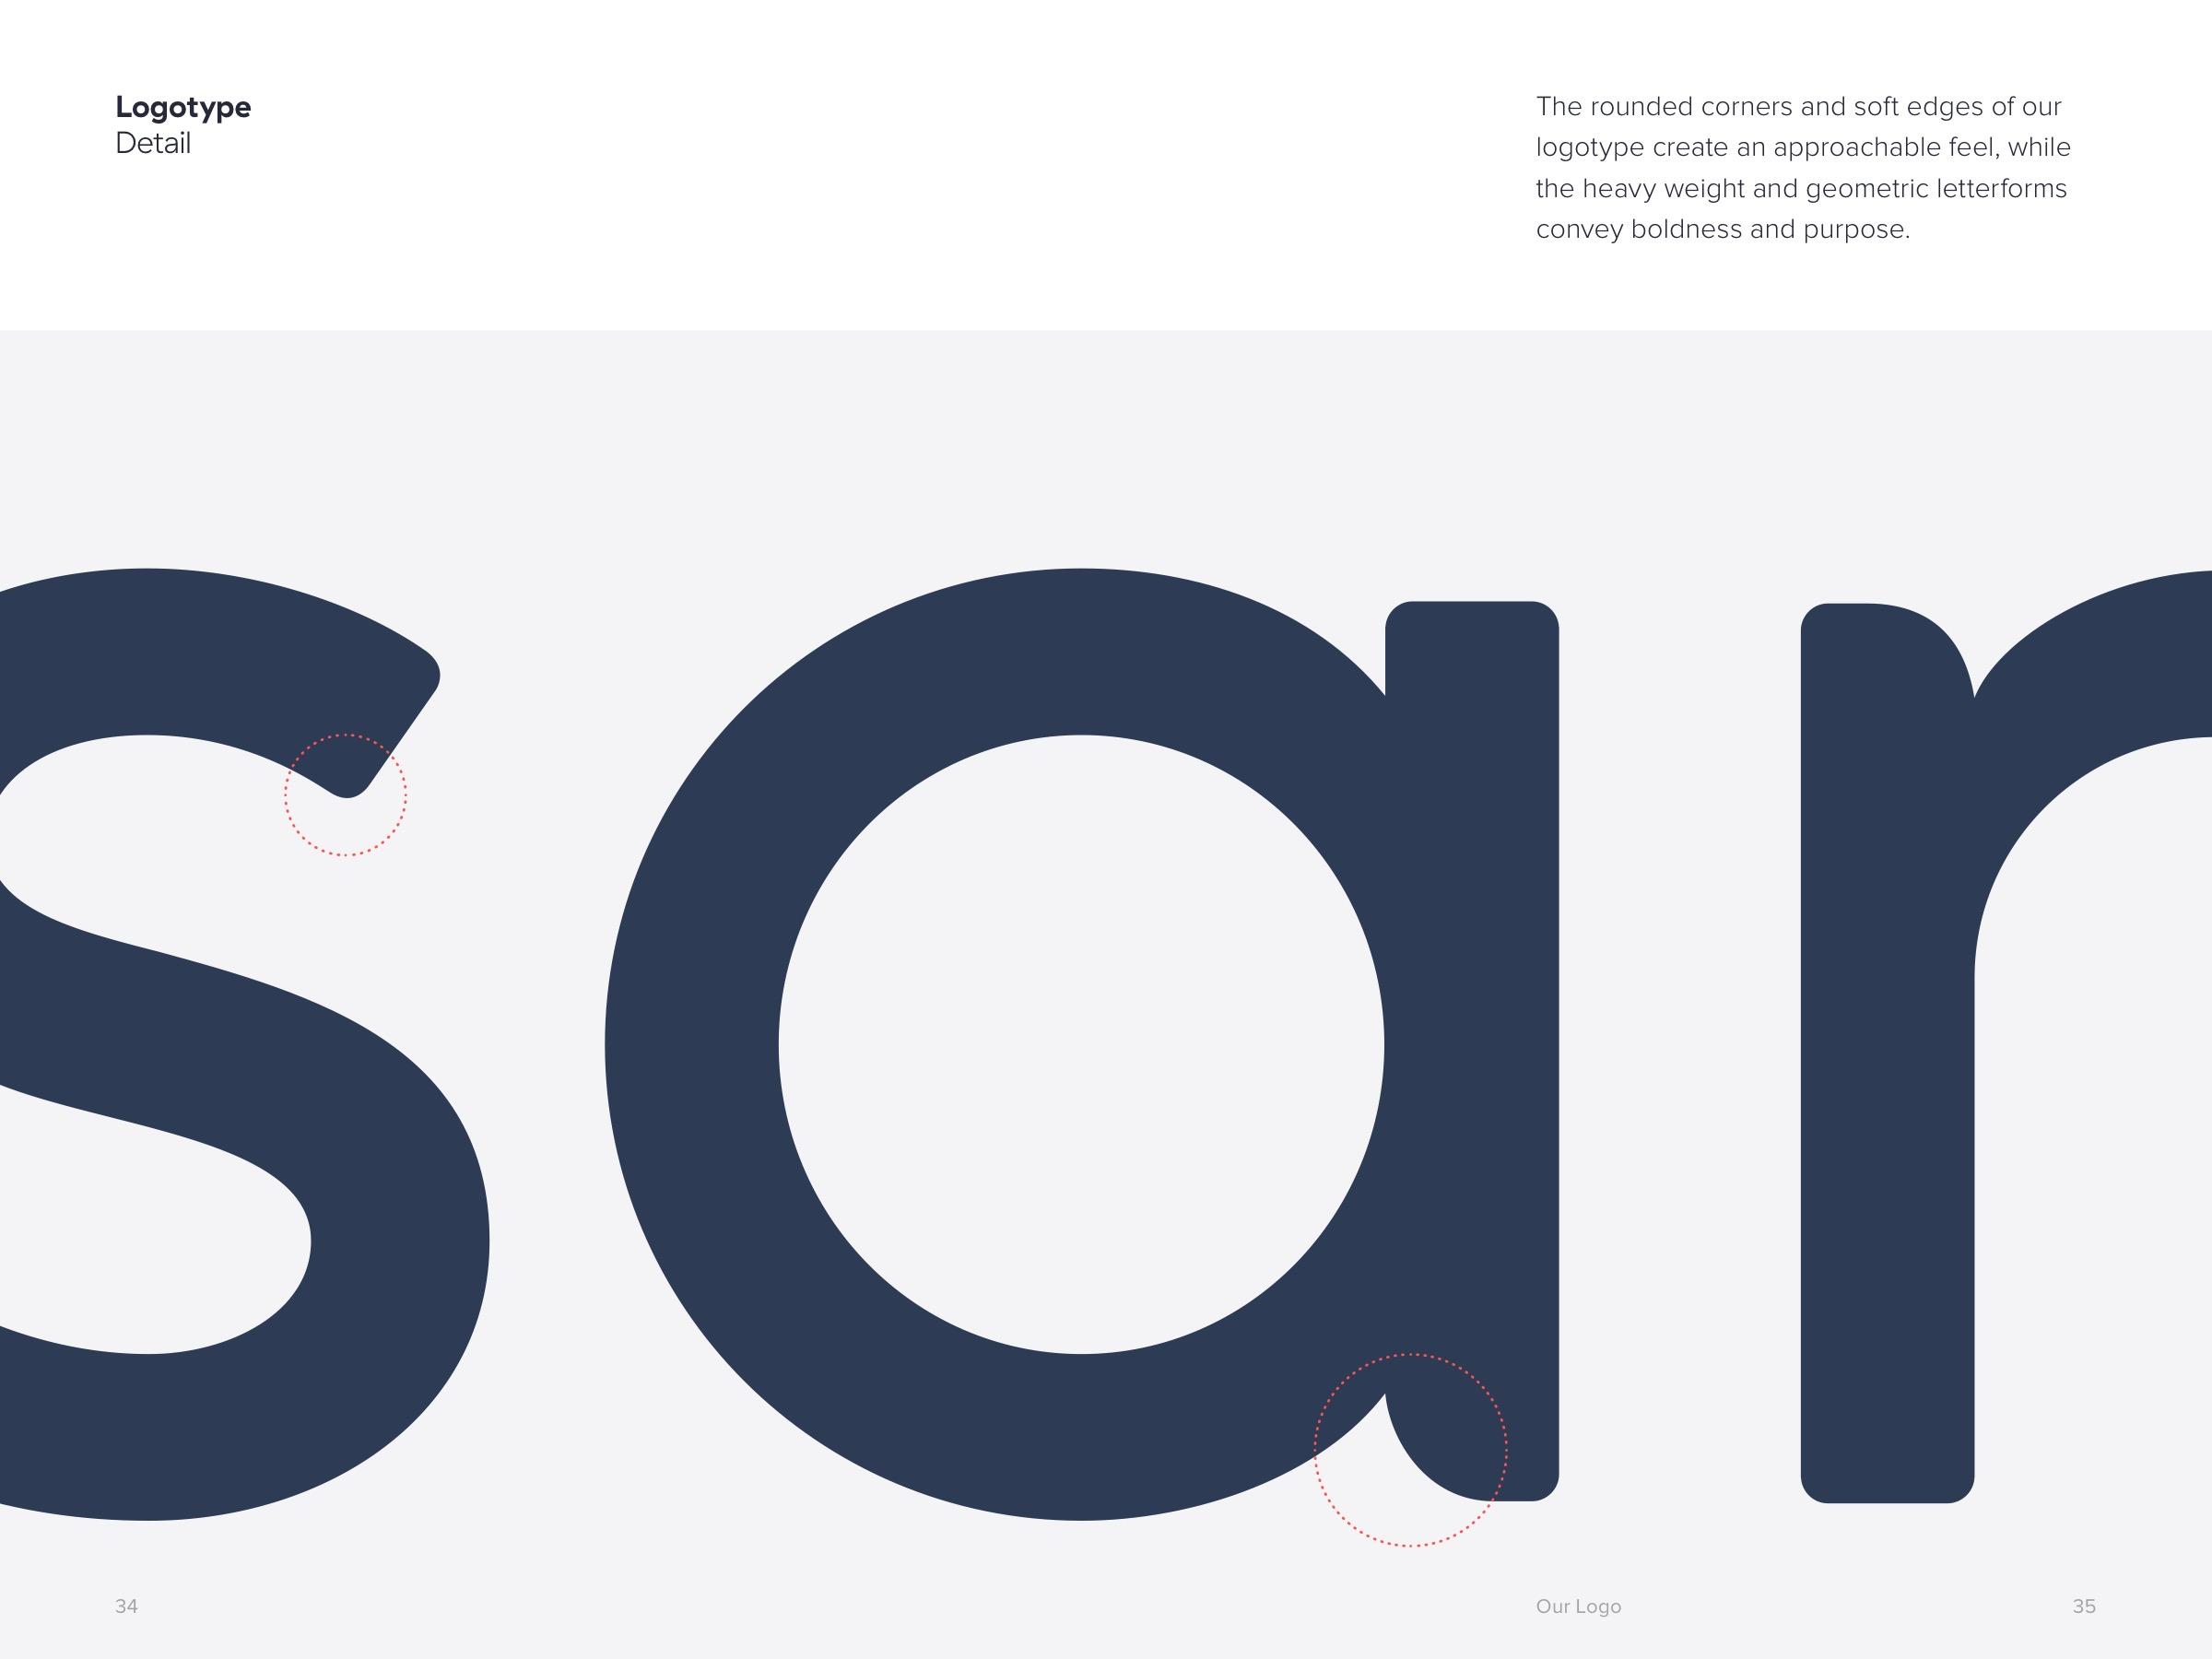 Asana-Brandbook-v1b 58.jpeg